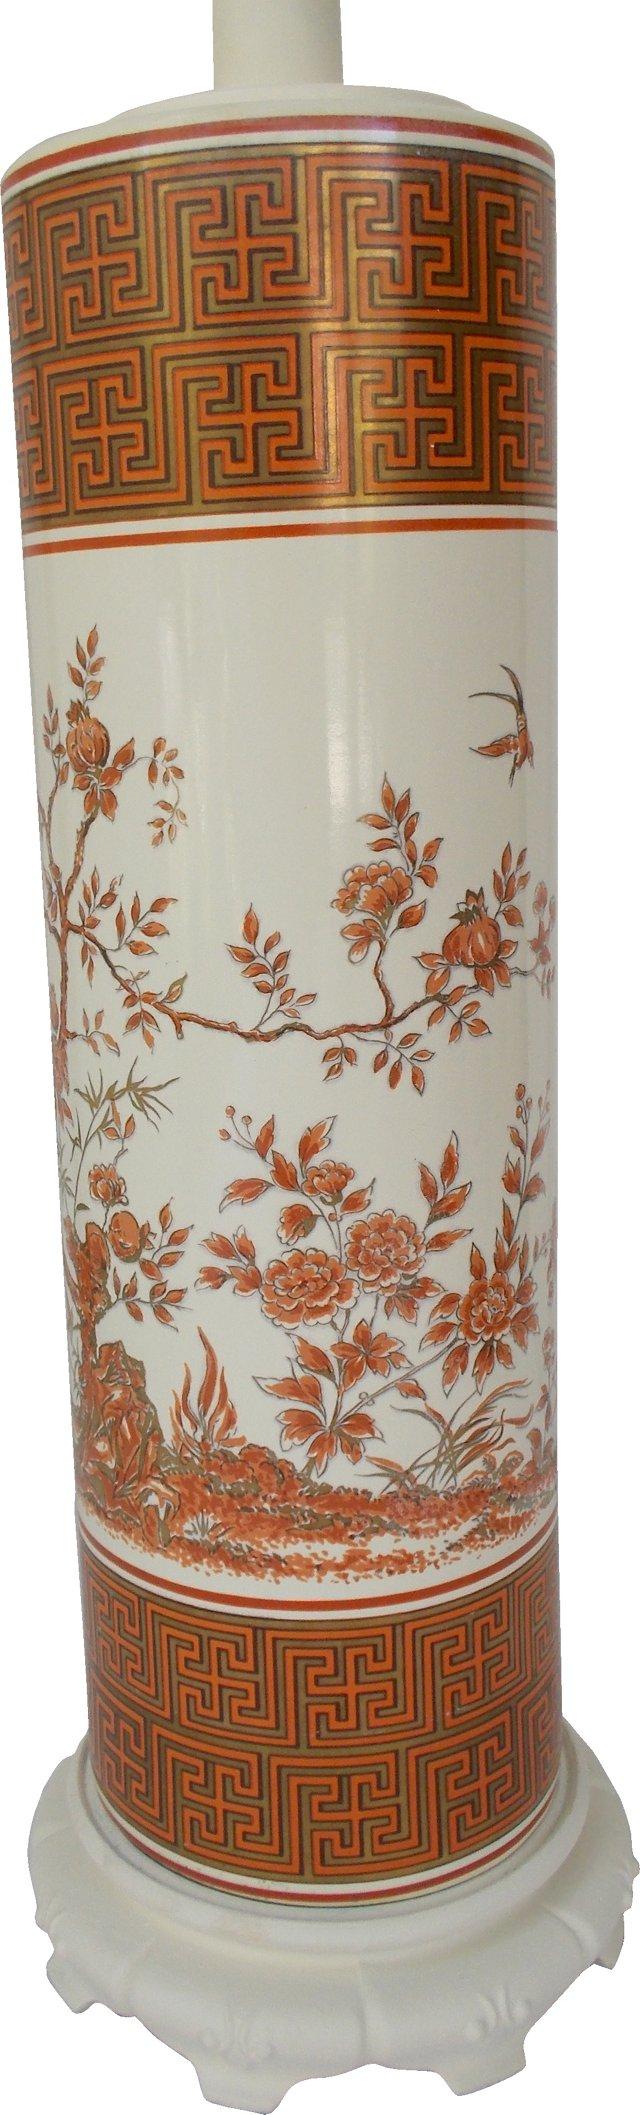 Porcelain Chinoiserie Lamp